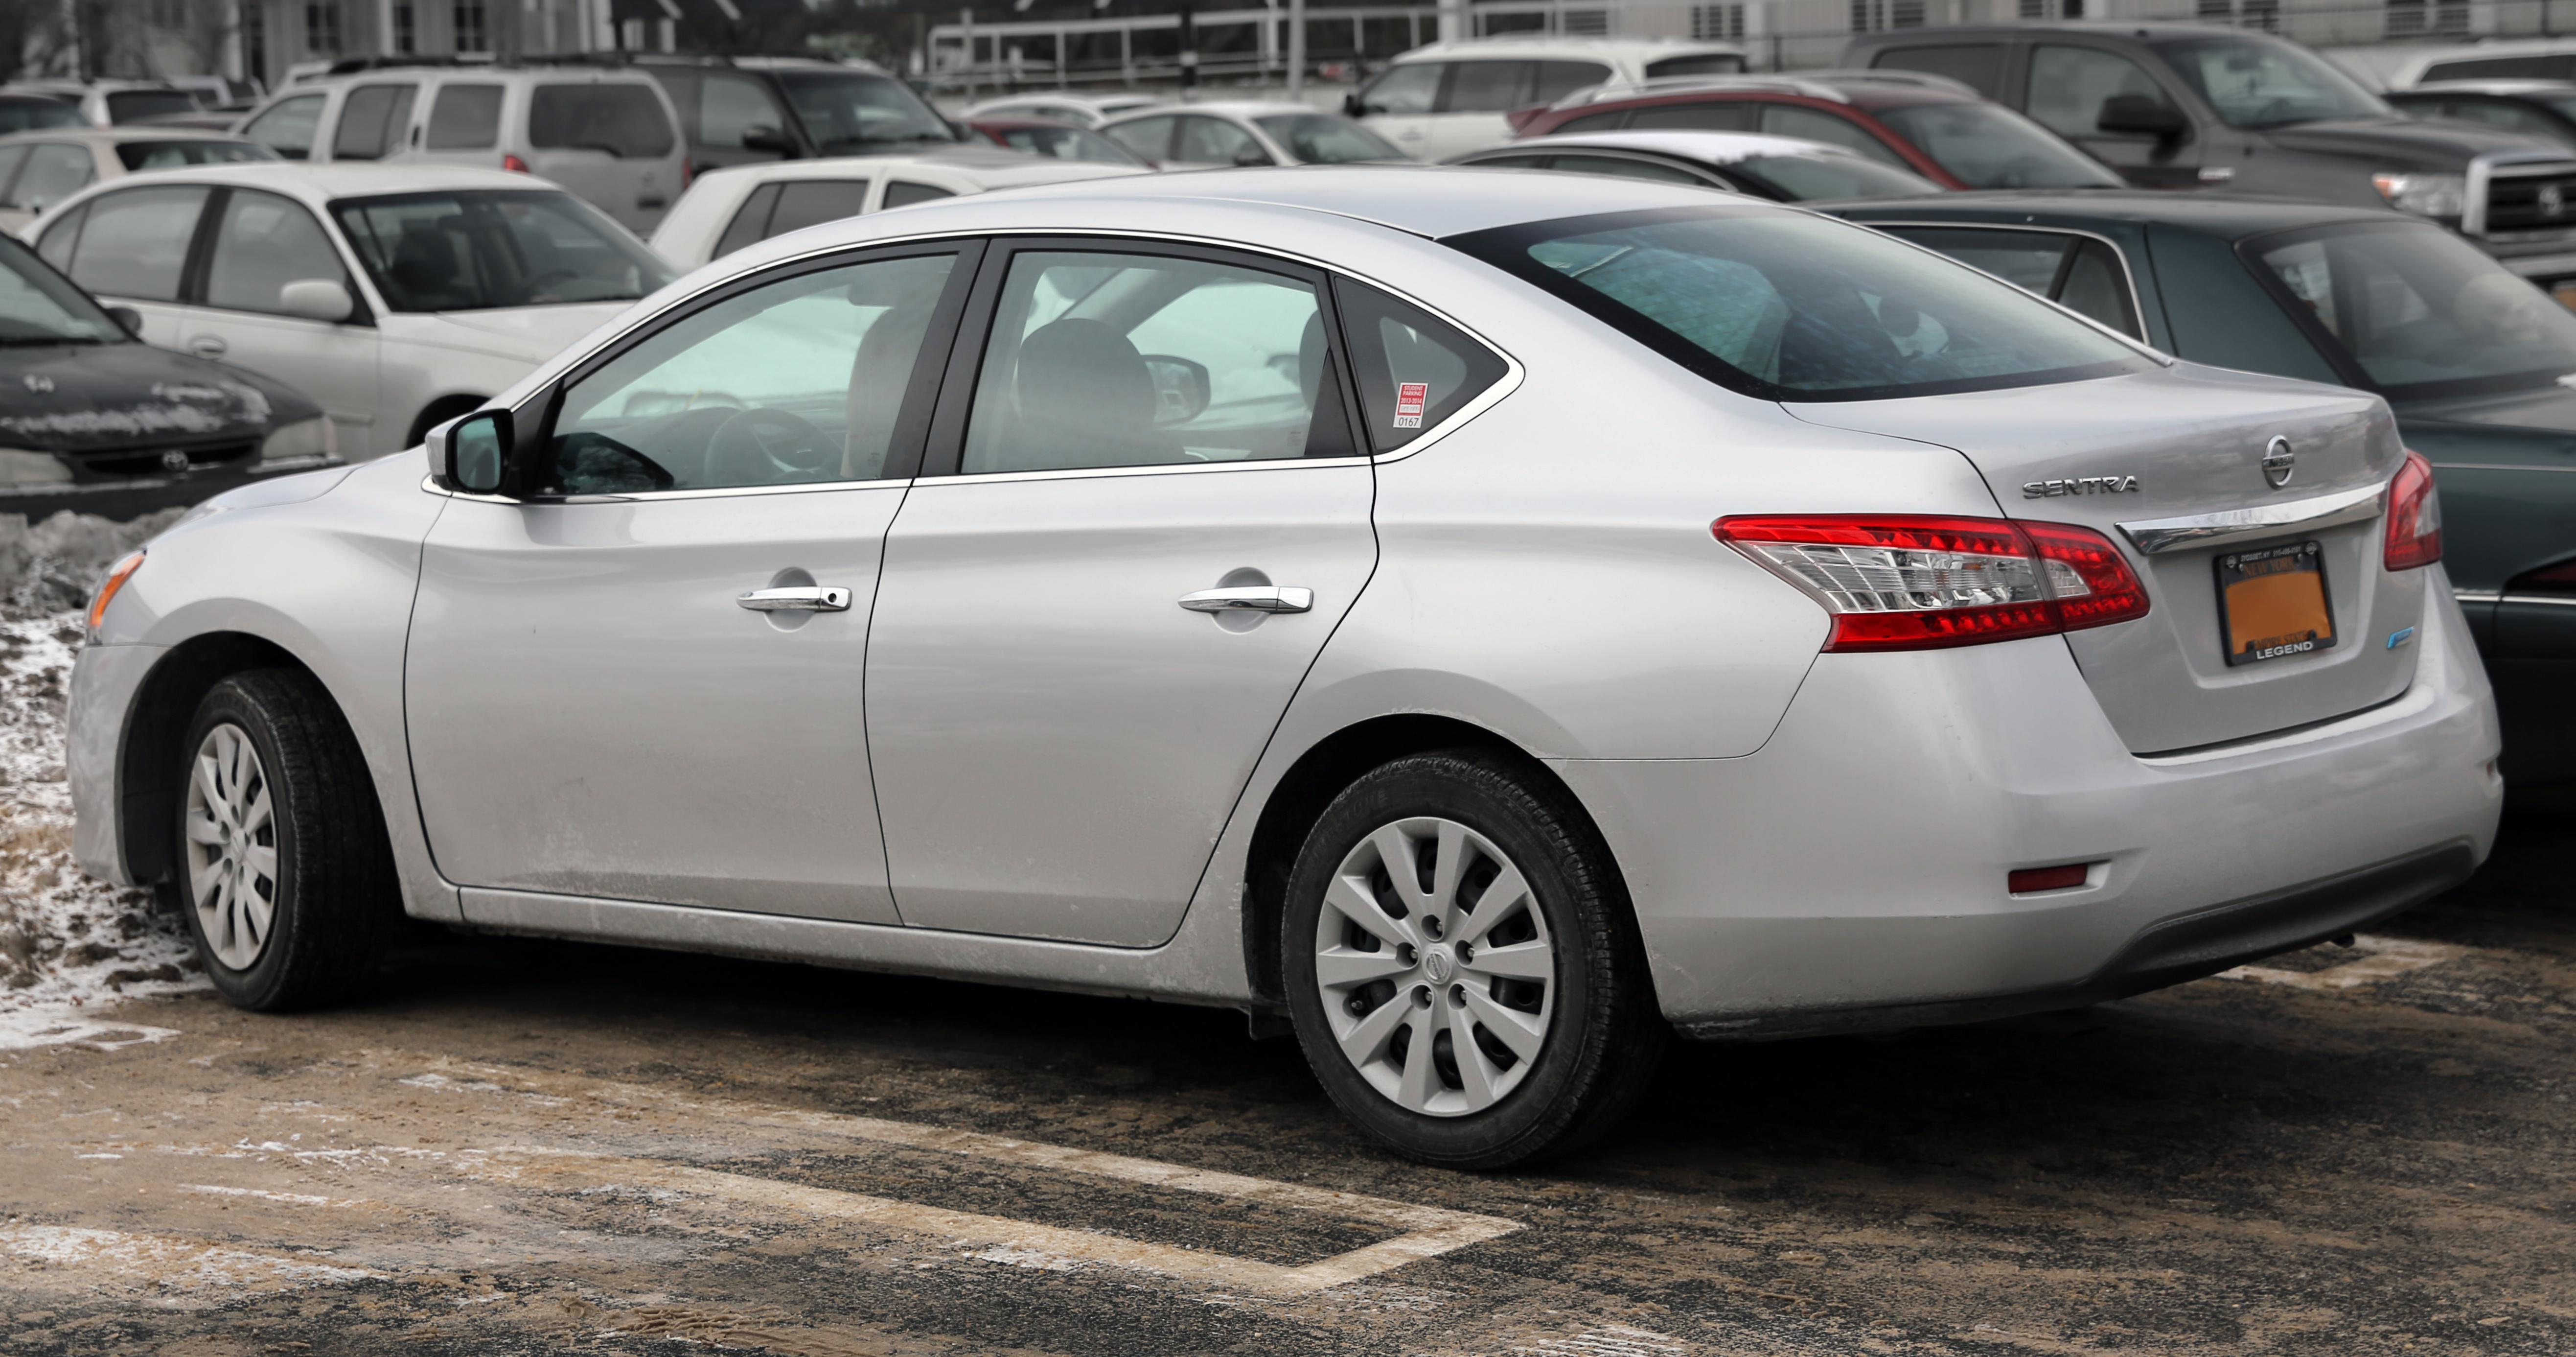 File:2014 Nissan Sentra S CVT, RL